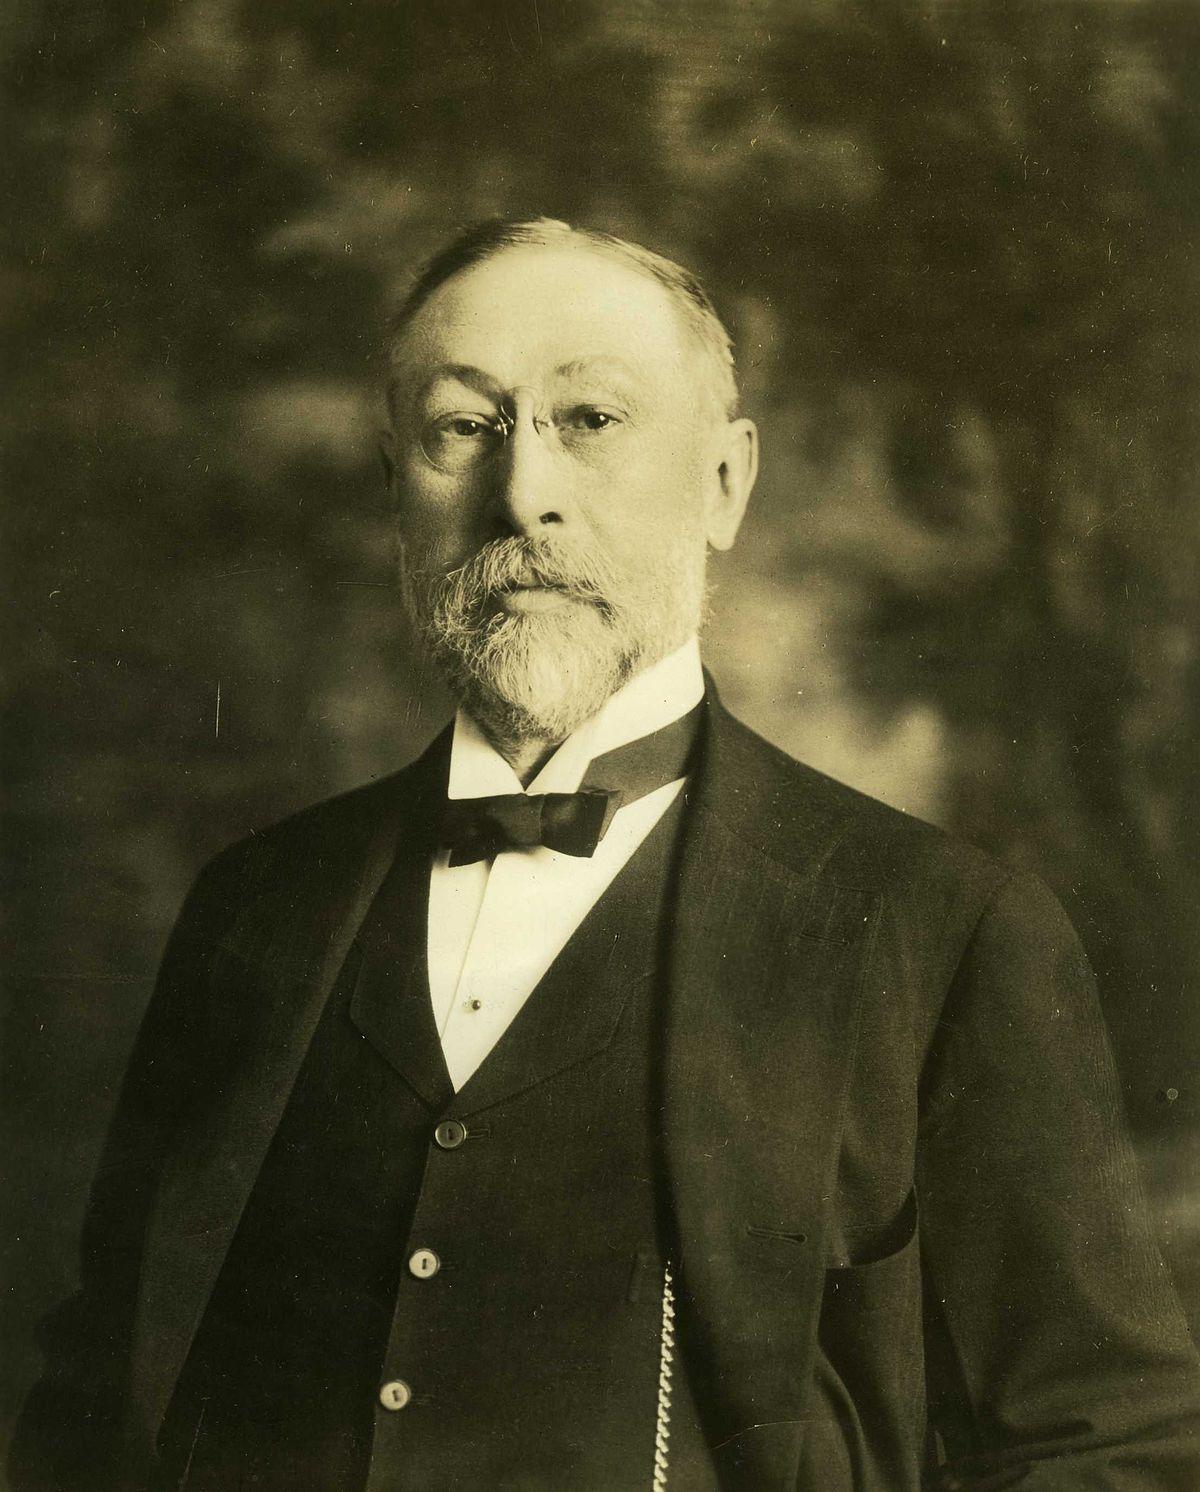 1200px-George_Charles_Boldt%2C_Sr._%281851-1916%29_portrait.jpg